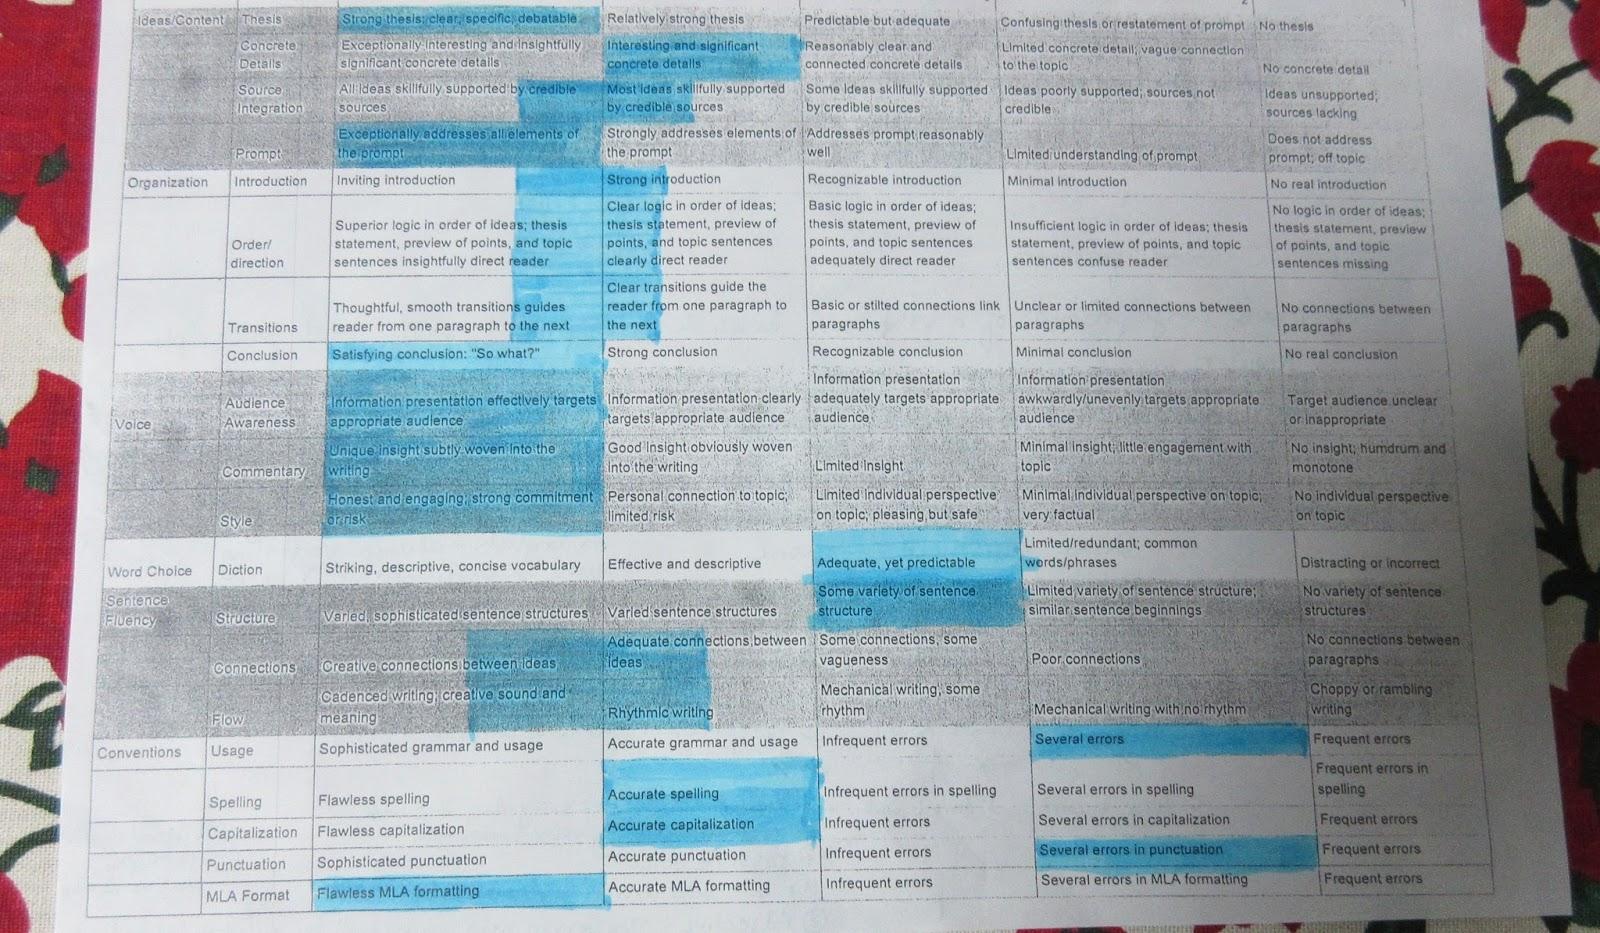 Heredity vs environment essay